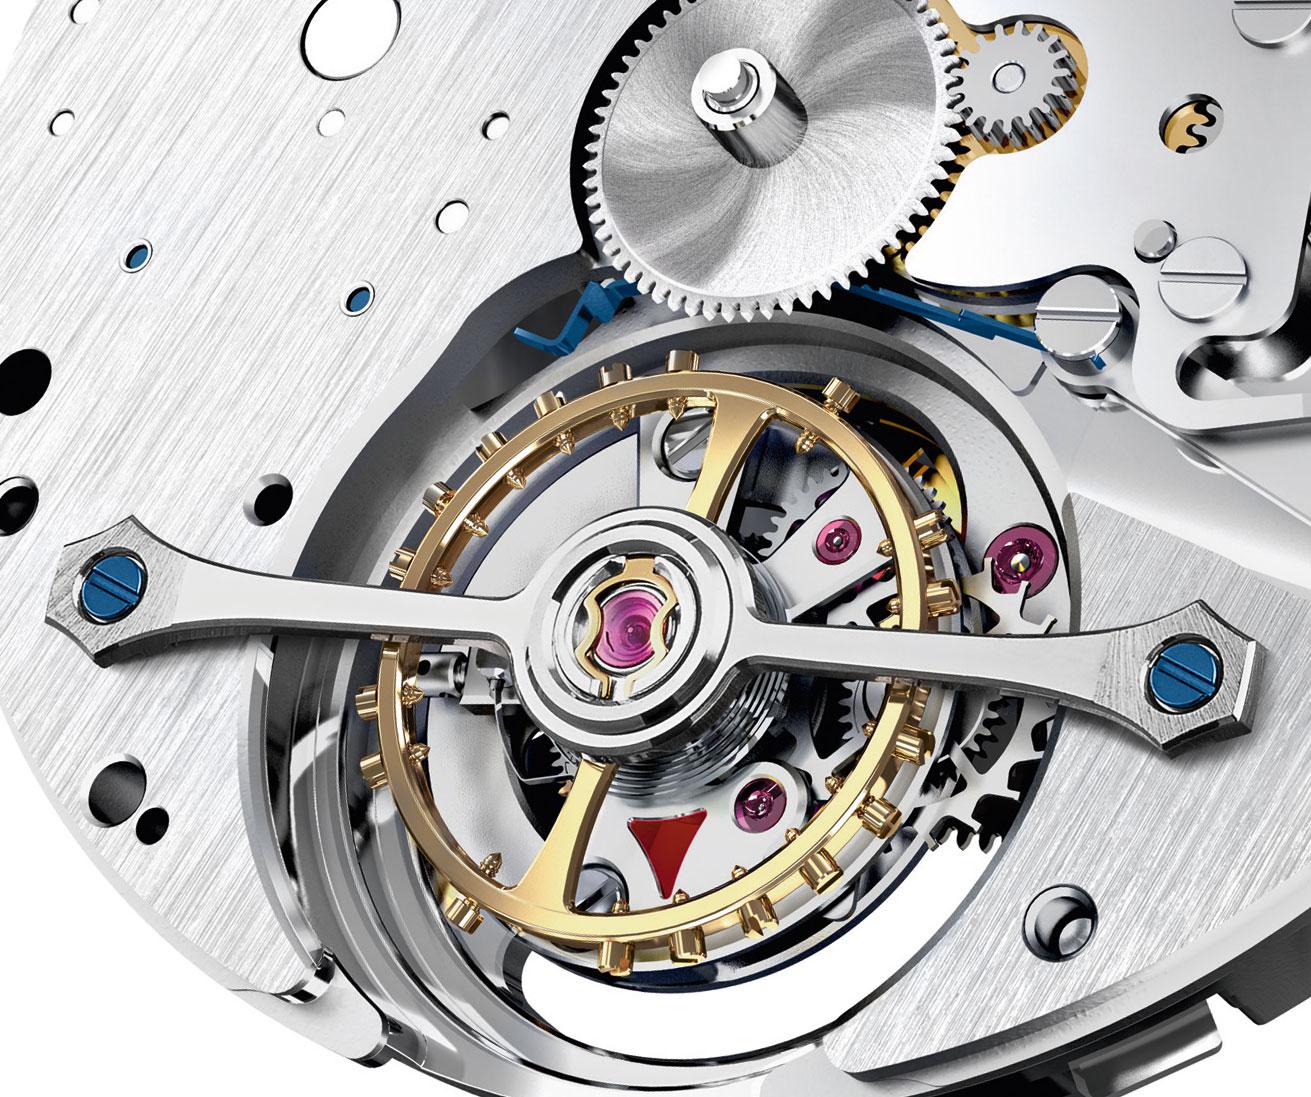 Montblanc Heritage Chronométrie Exo Tourbillon movement